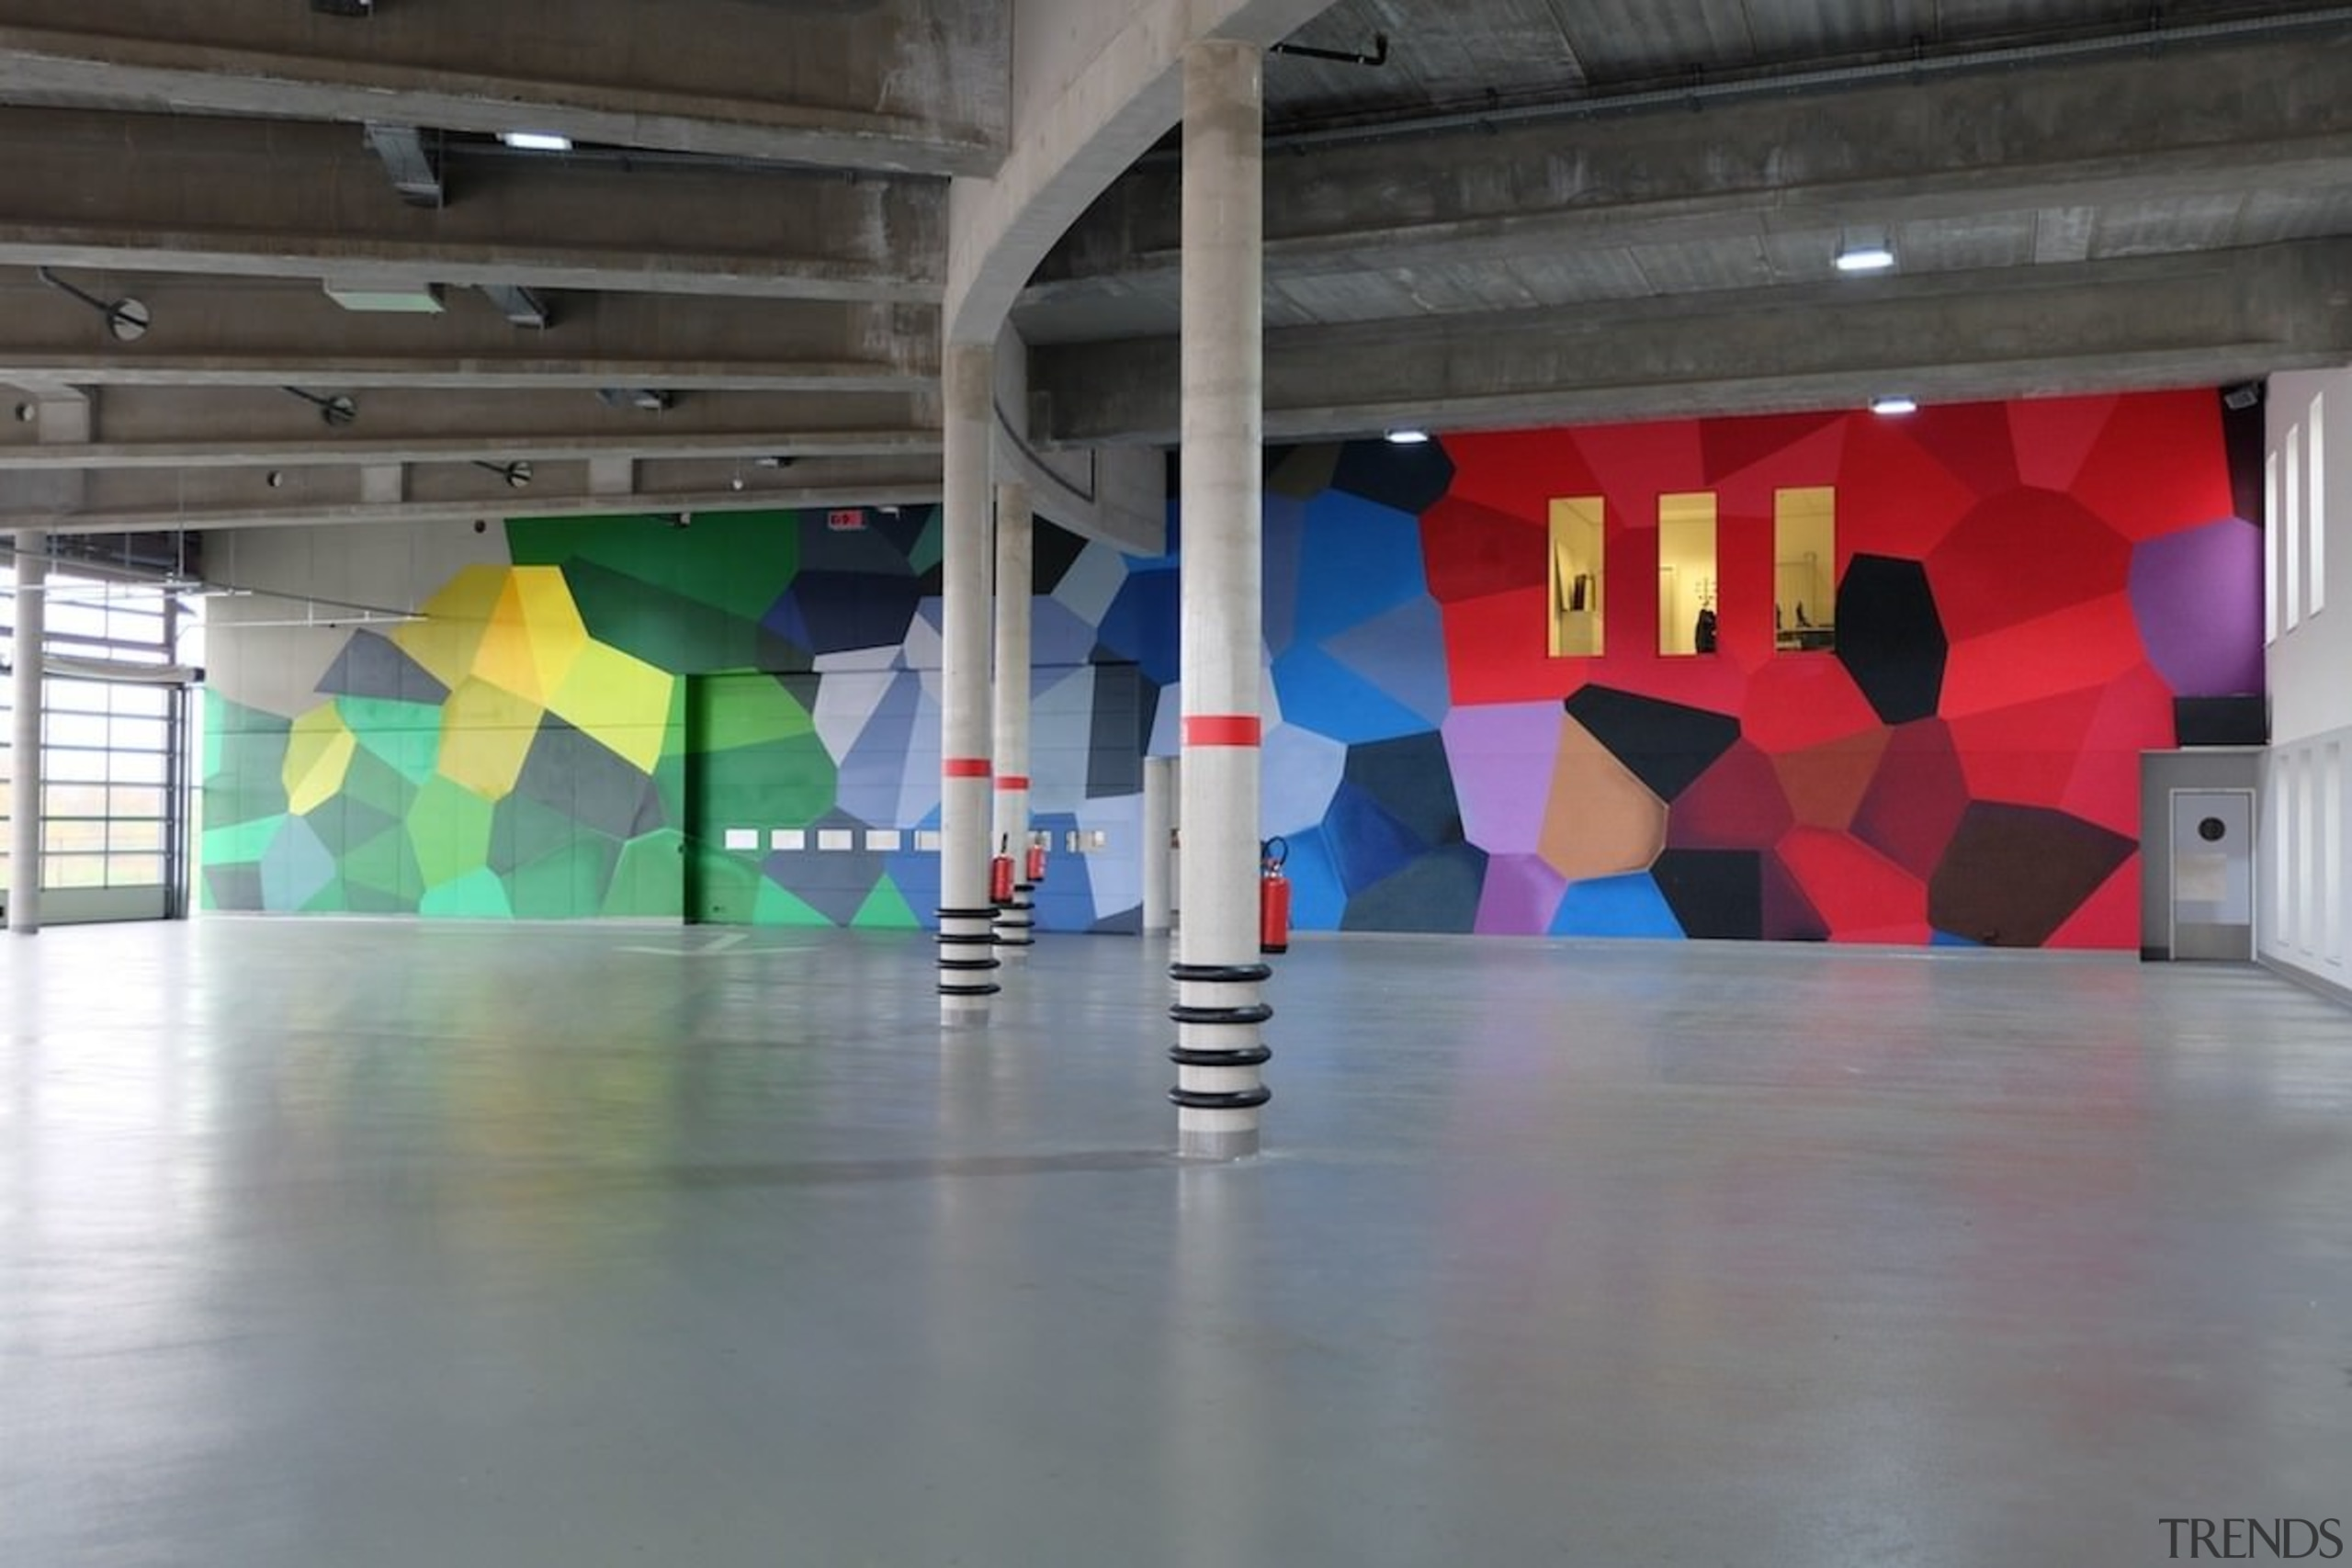 569 firestation - 569 firestation - art | art, art gallery, exhibition, floor, modern art, tourist attraction, gray